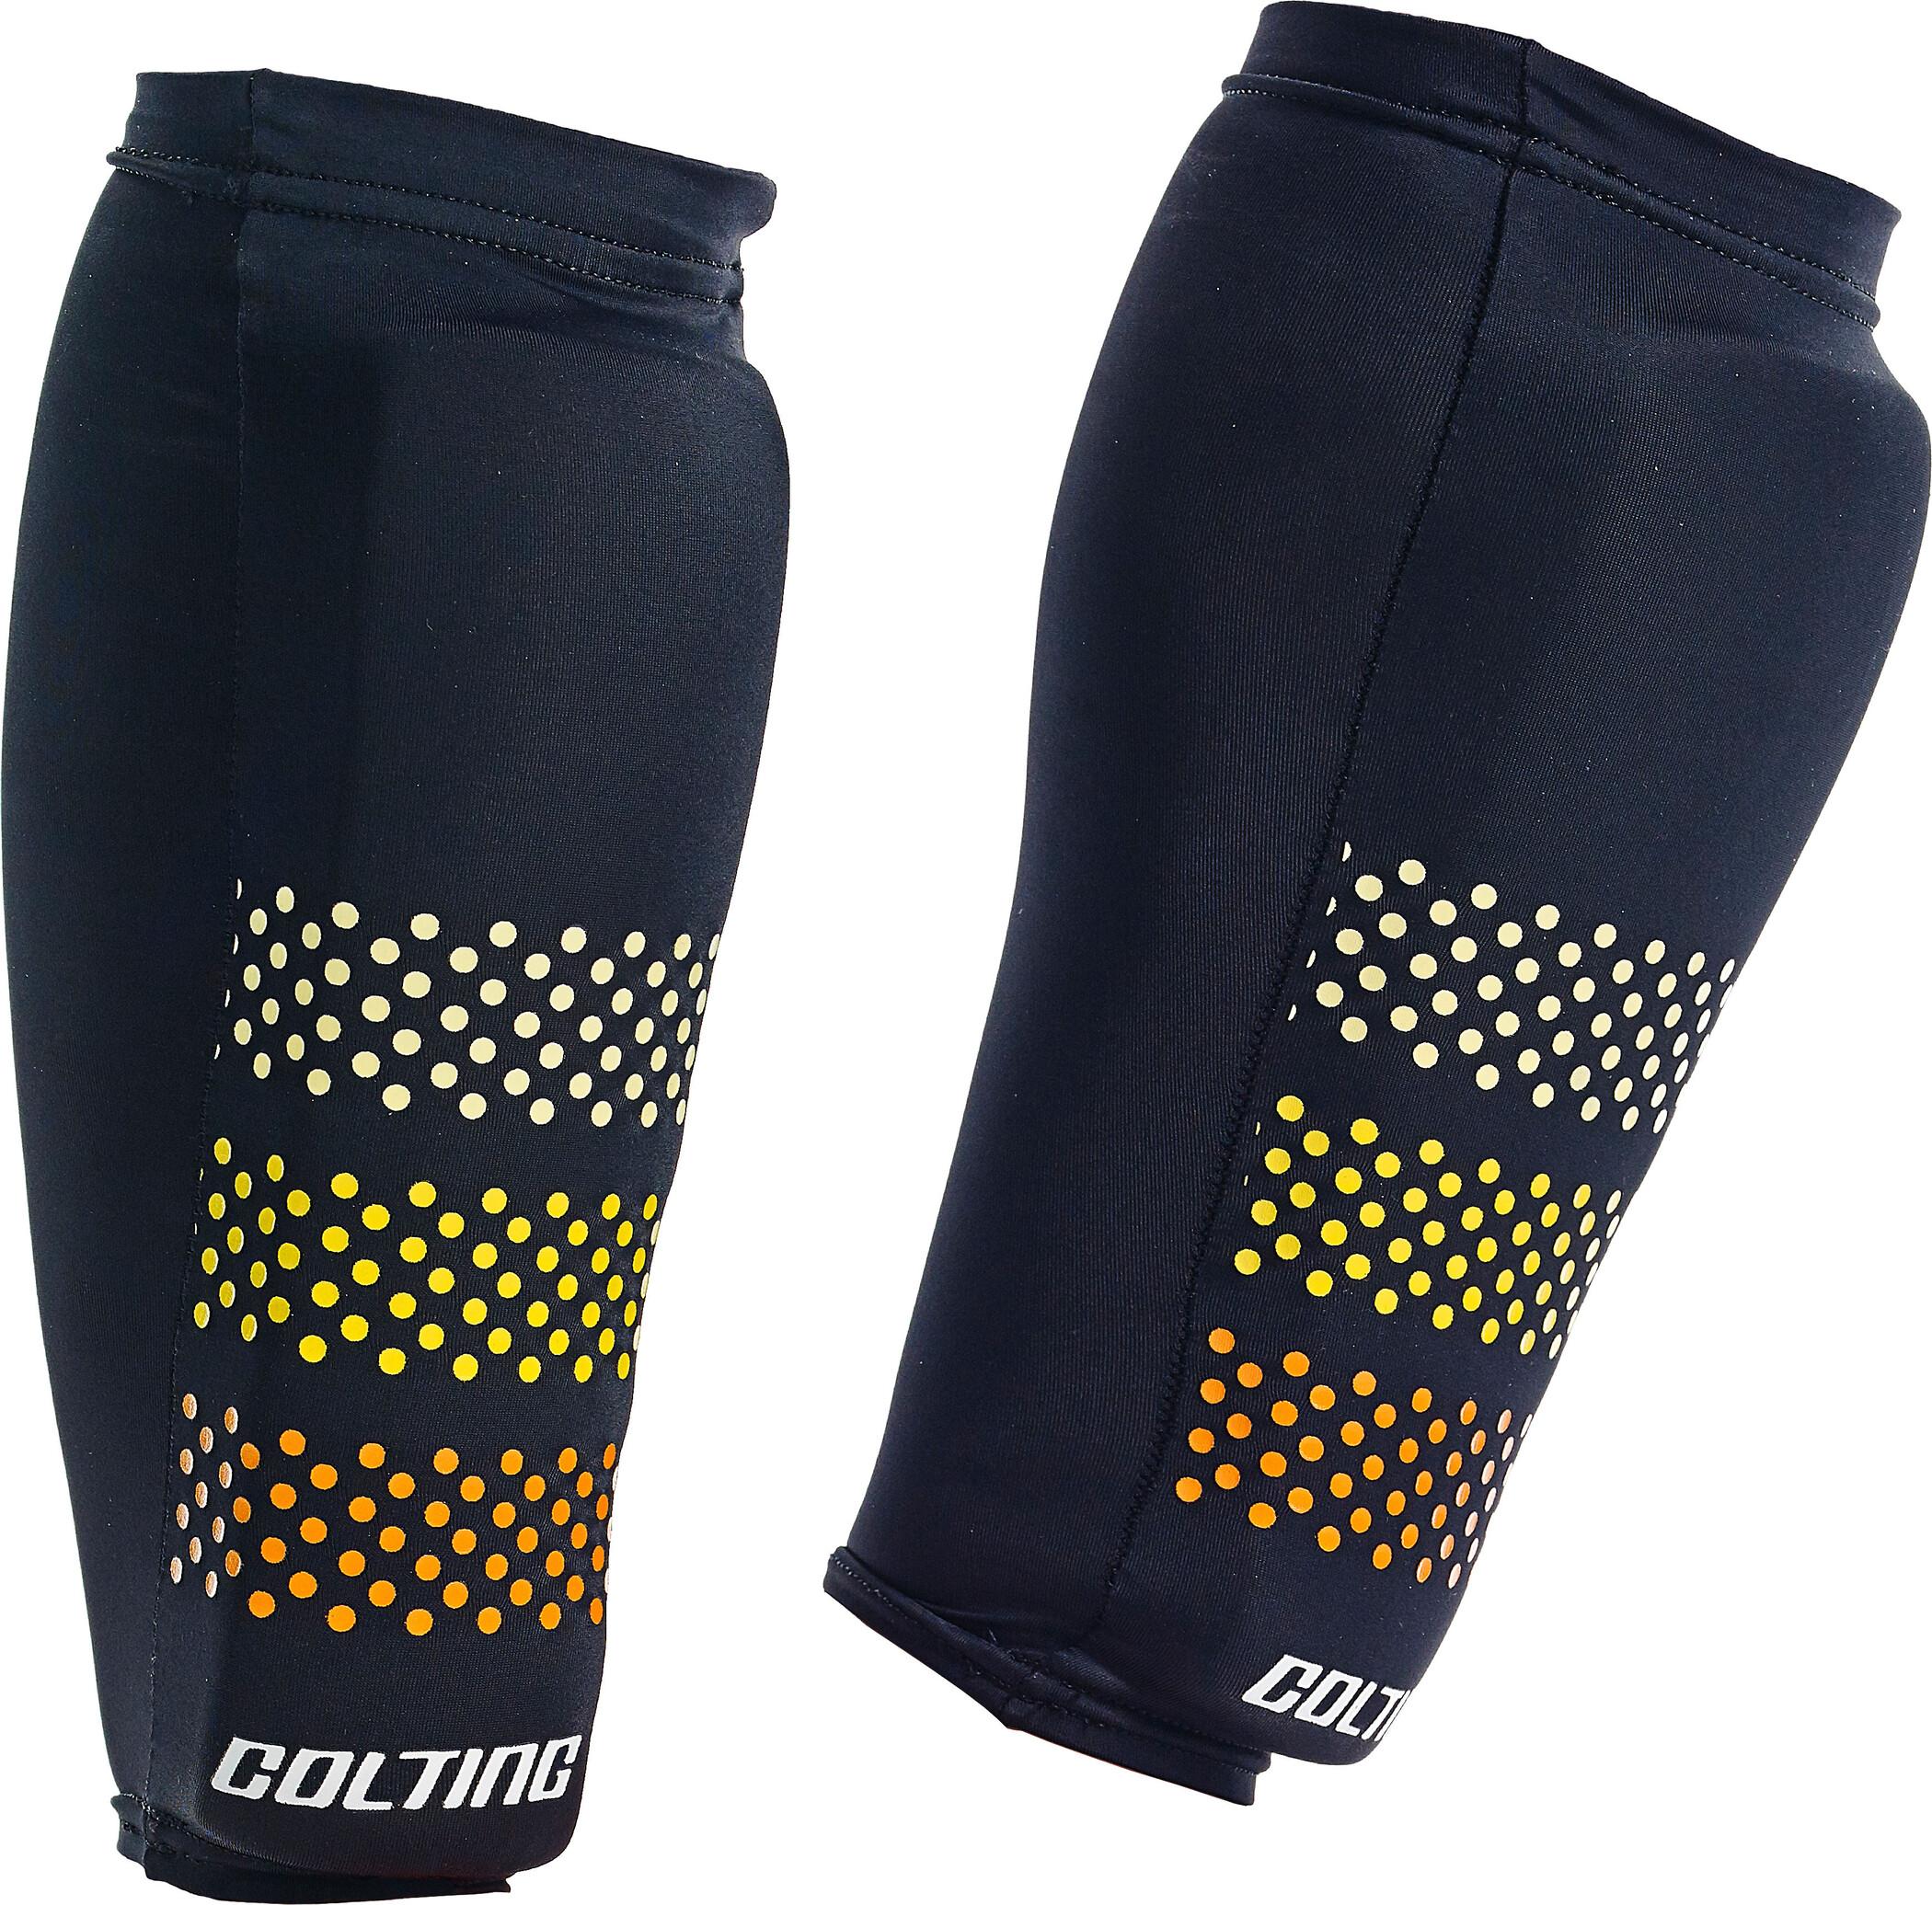 Colting Wetsuits SC02 Extreme Float Swim Calfs, black (2019) | swim_clothes